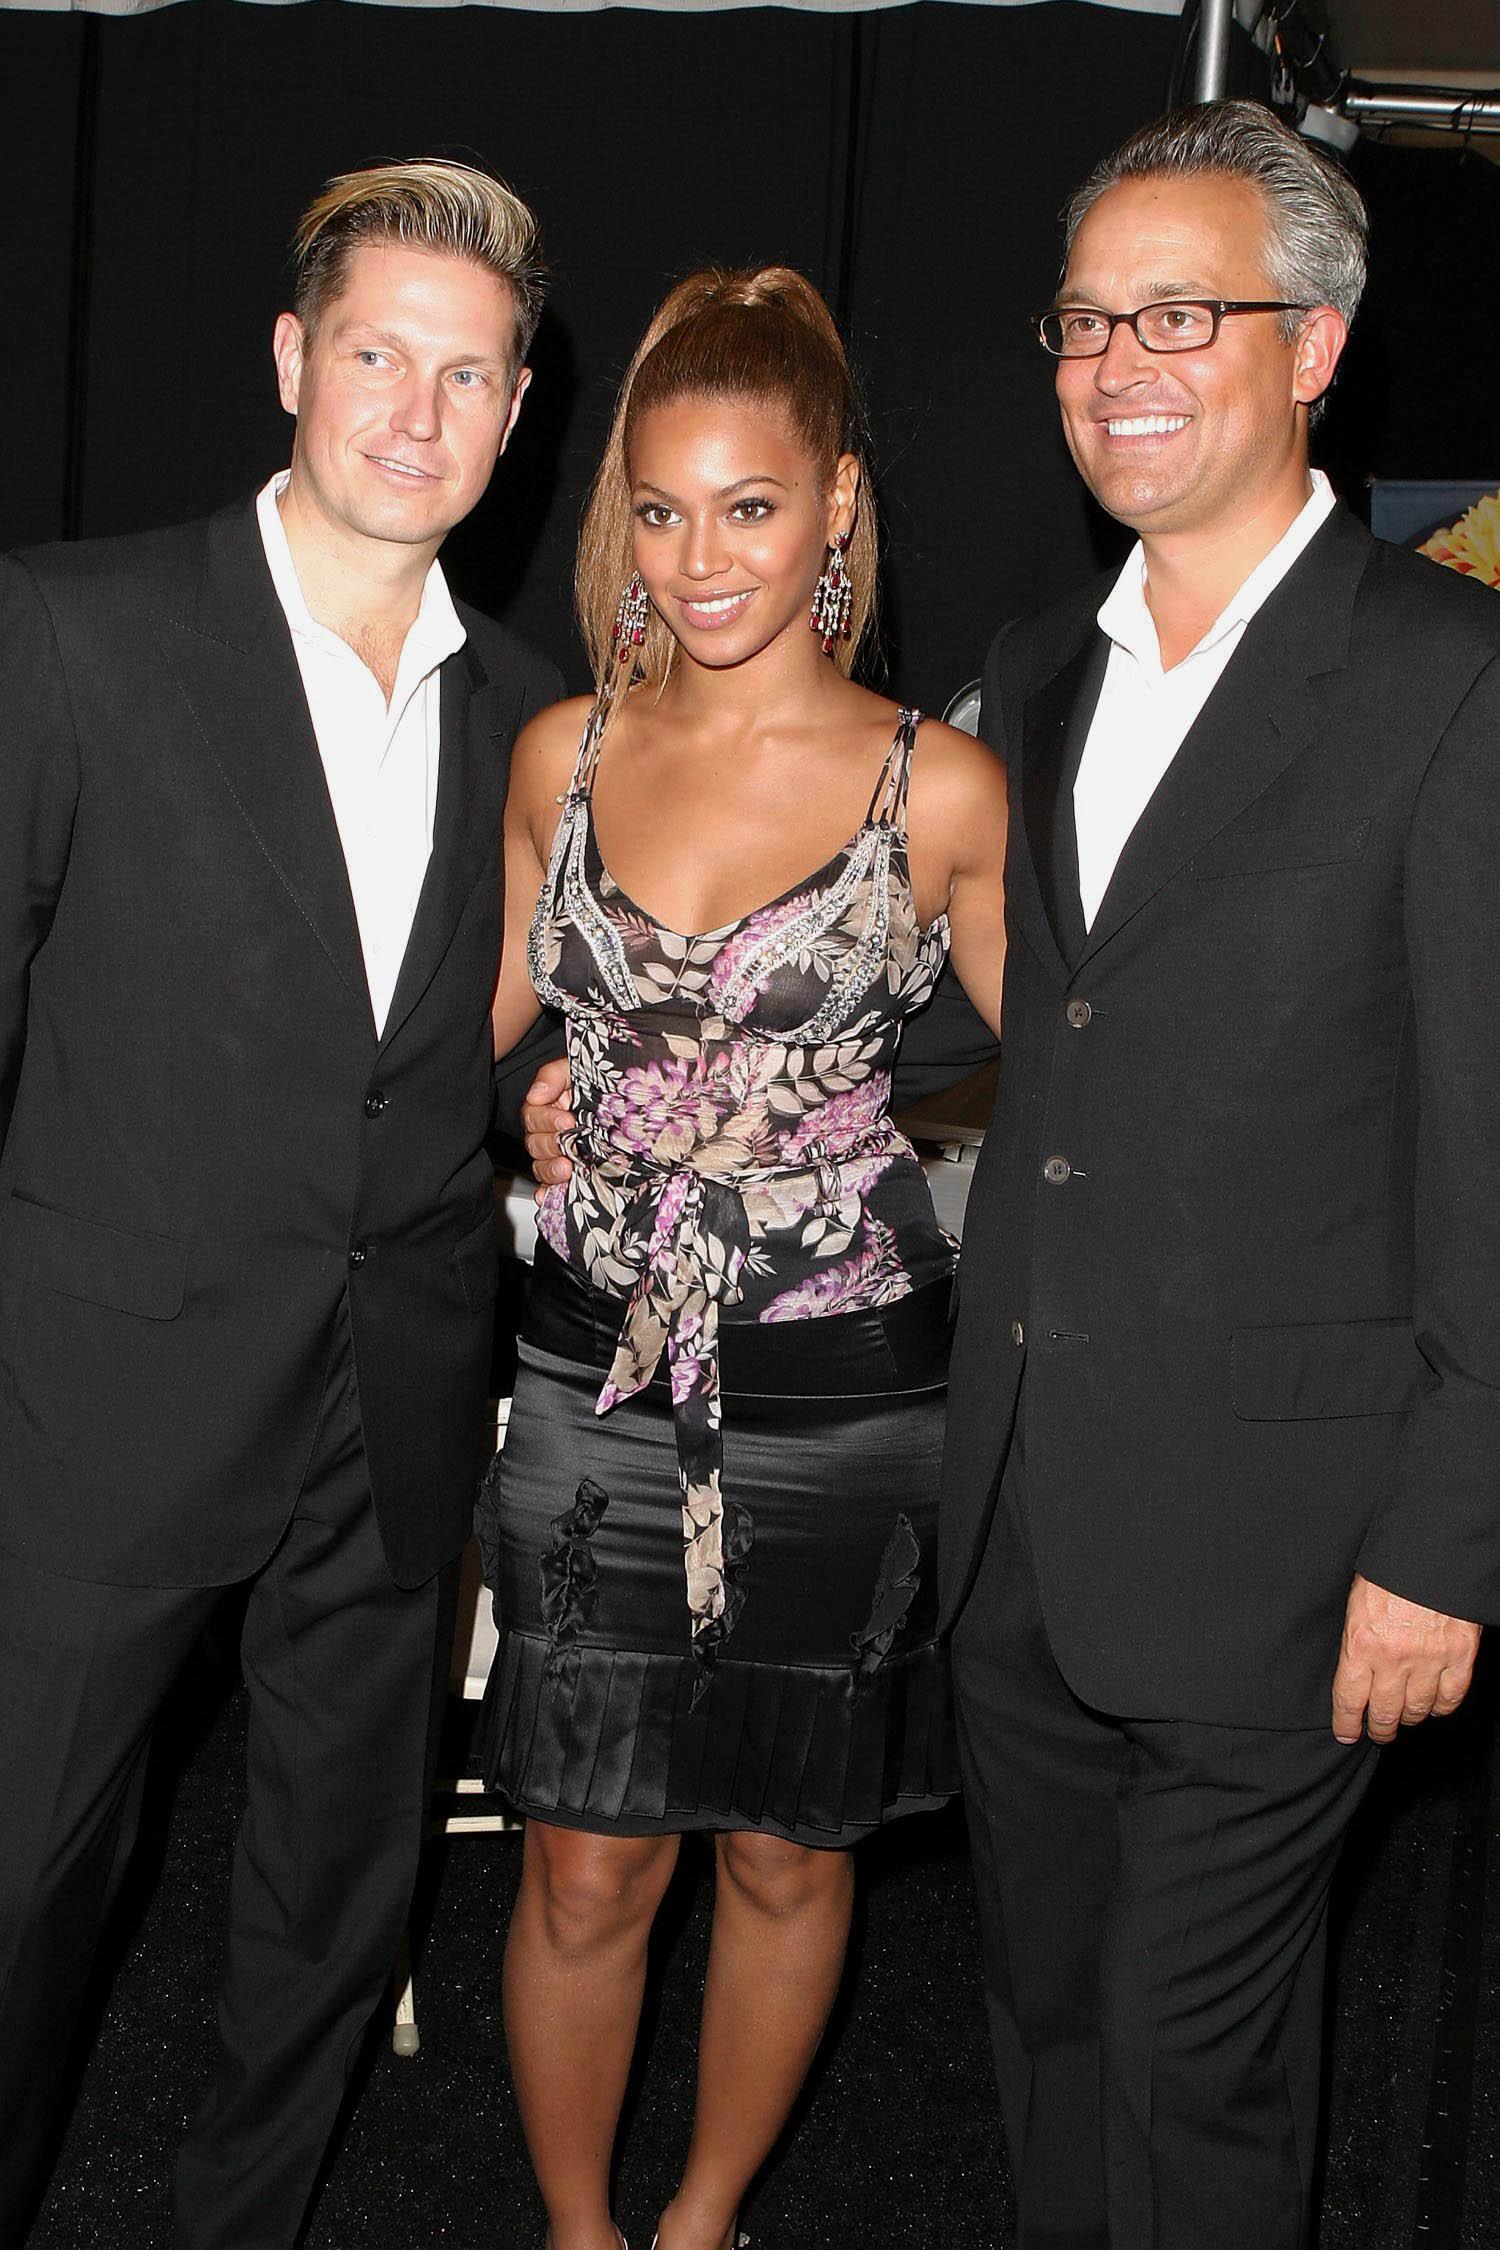 James Mischka, Beyonce Knowles and Mark MischkaBADGLEY MISCHKA SHOW FOR SPRING / SUMMER 2004, NEW YORK FASHION WEEK, AMERICA - 16 SEP 2003